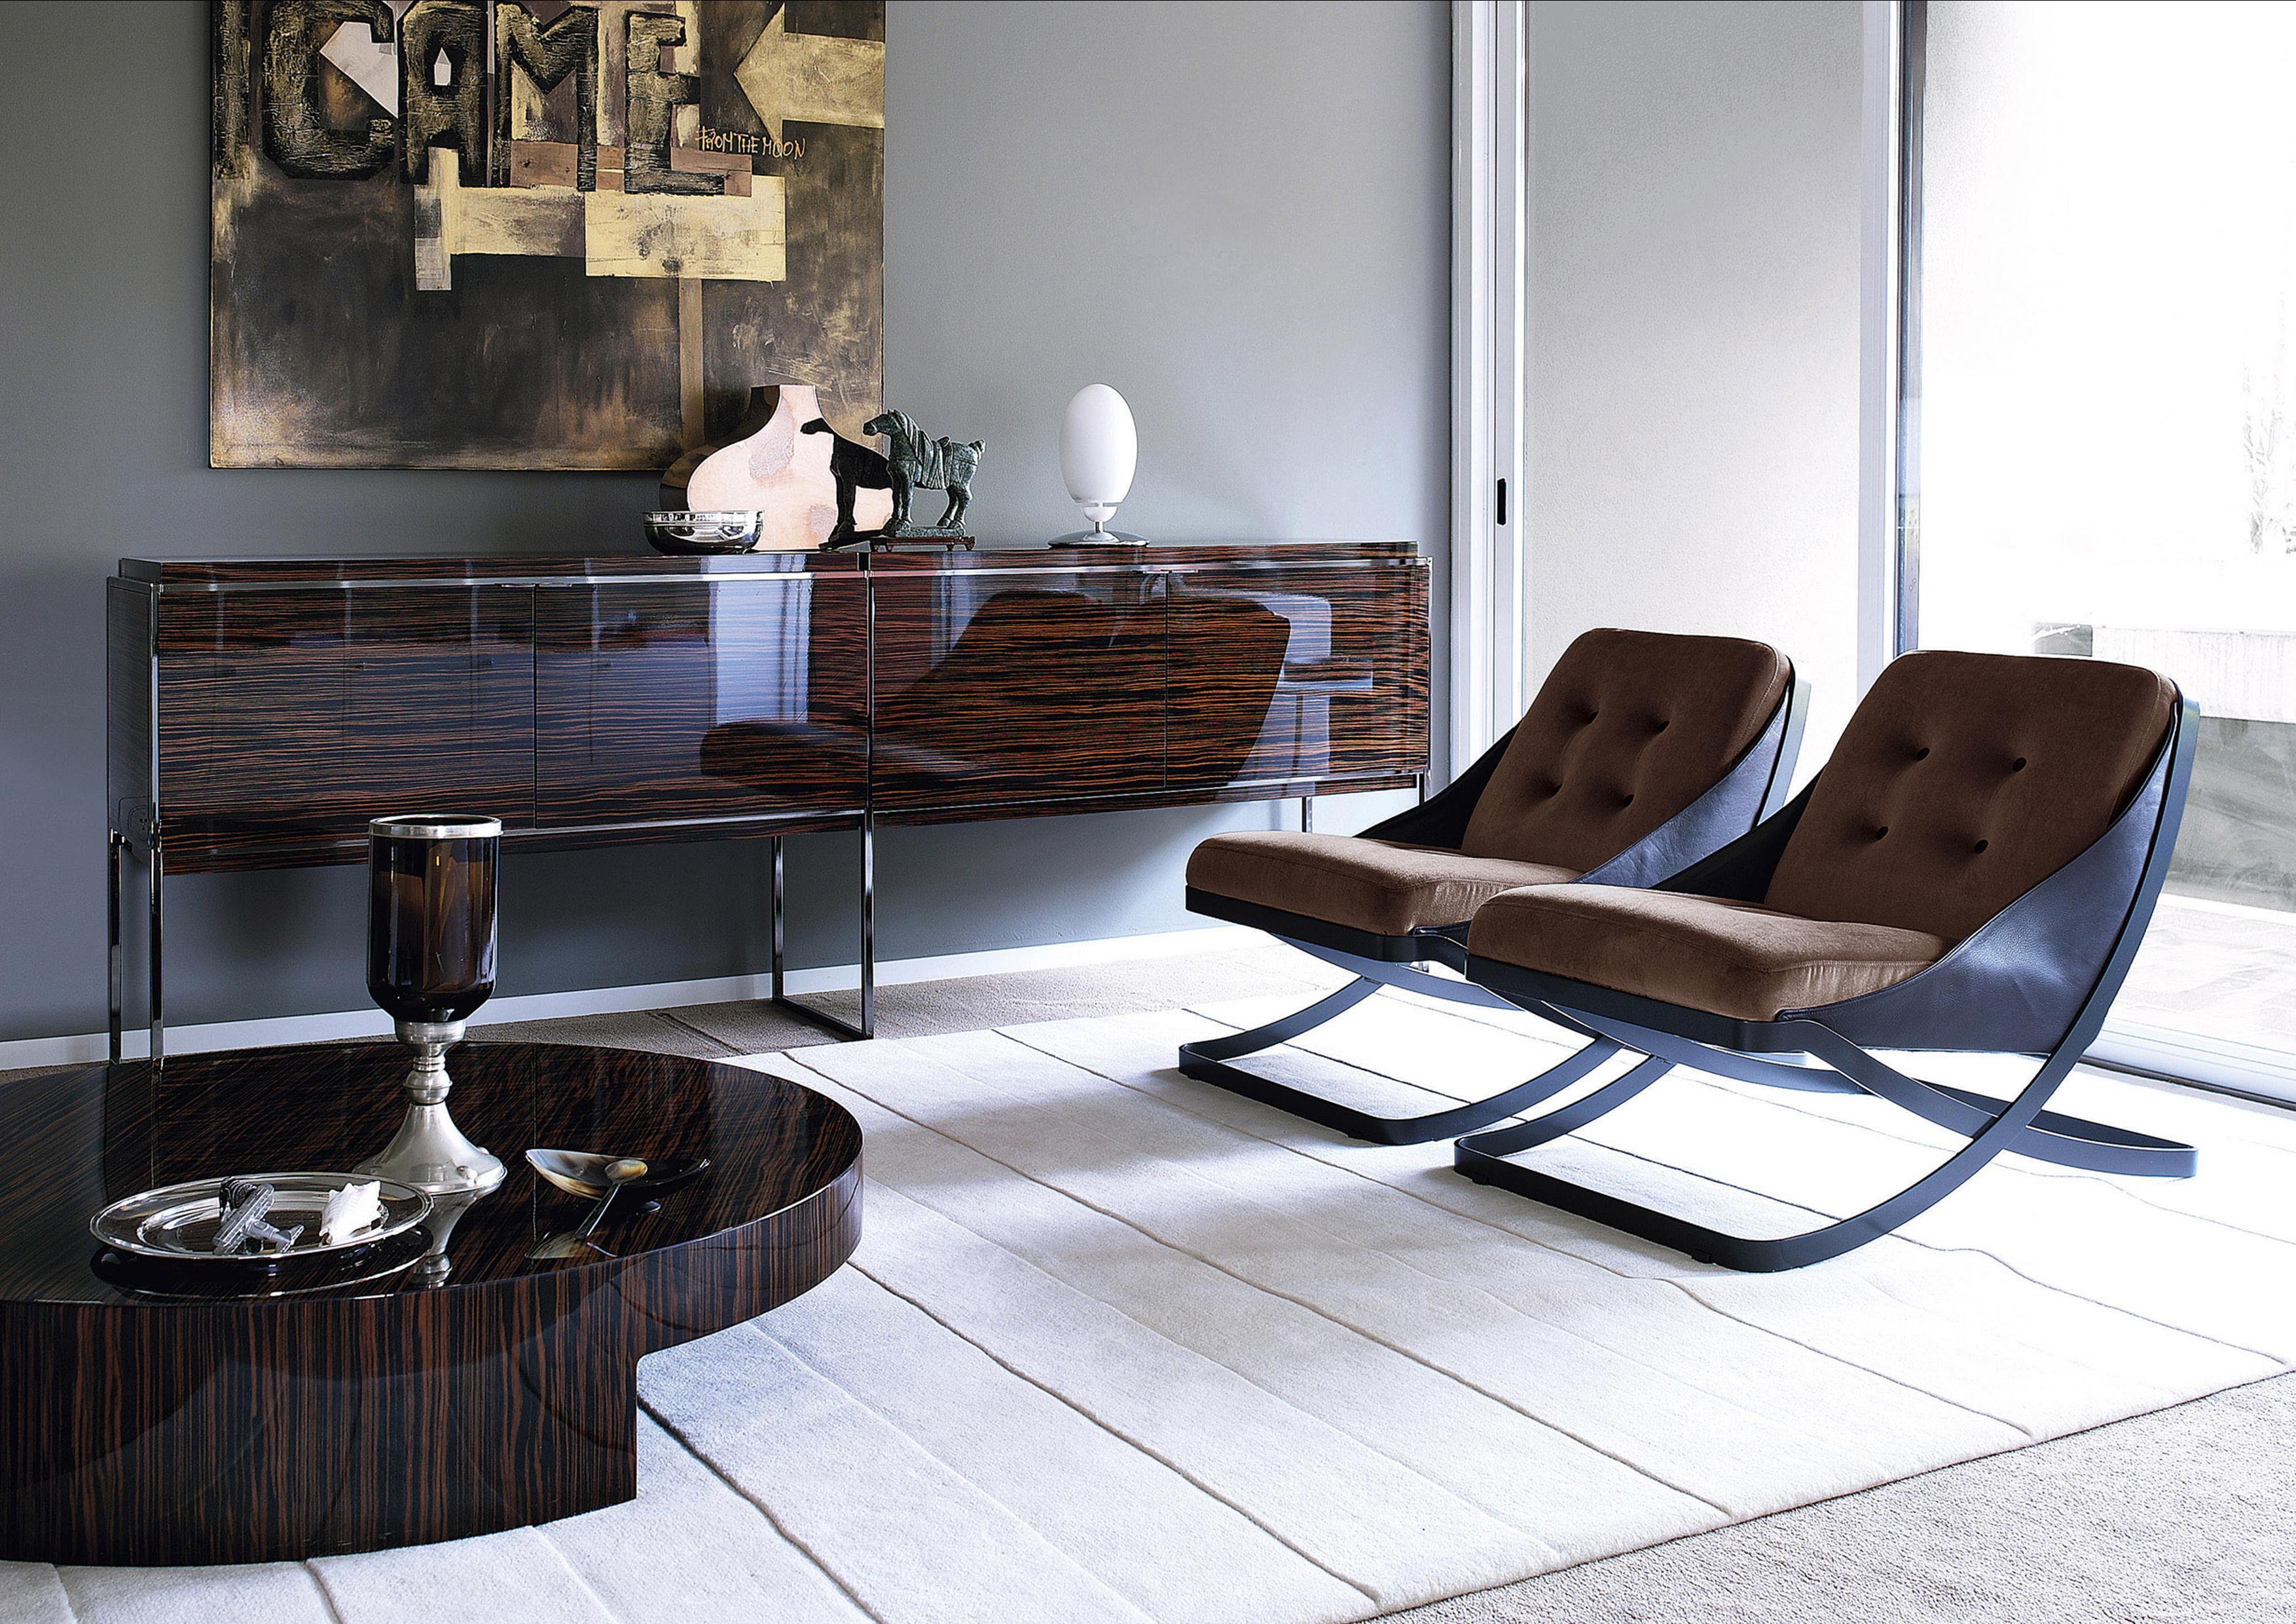 ultramodern cabinets